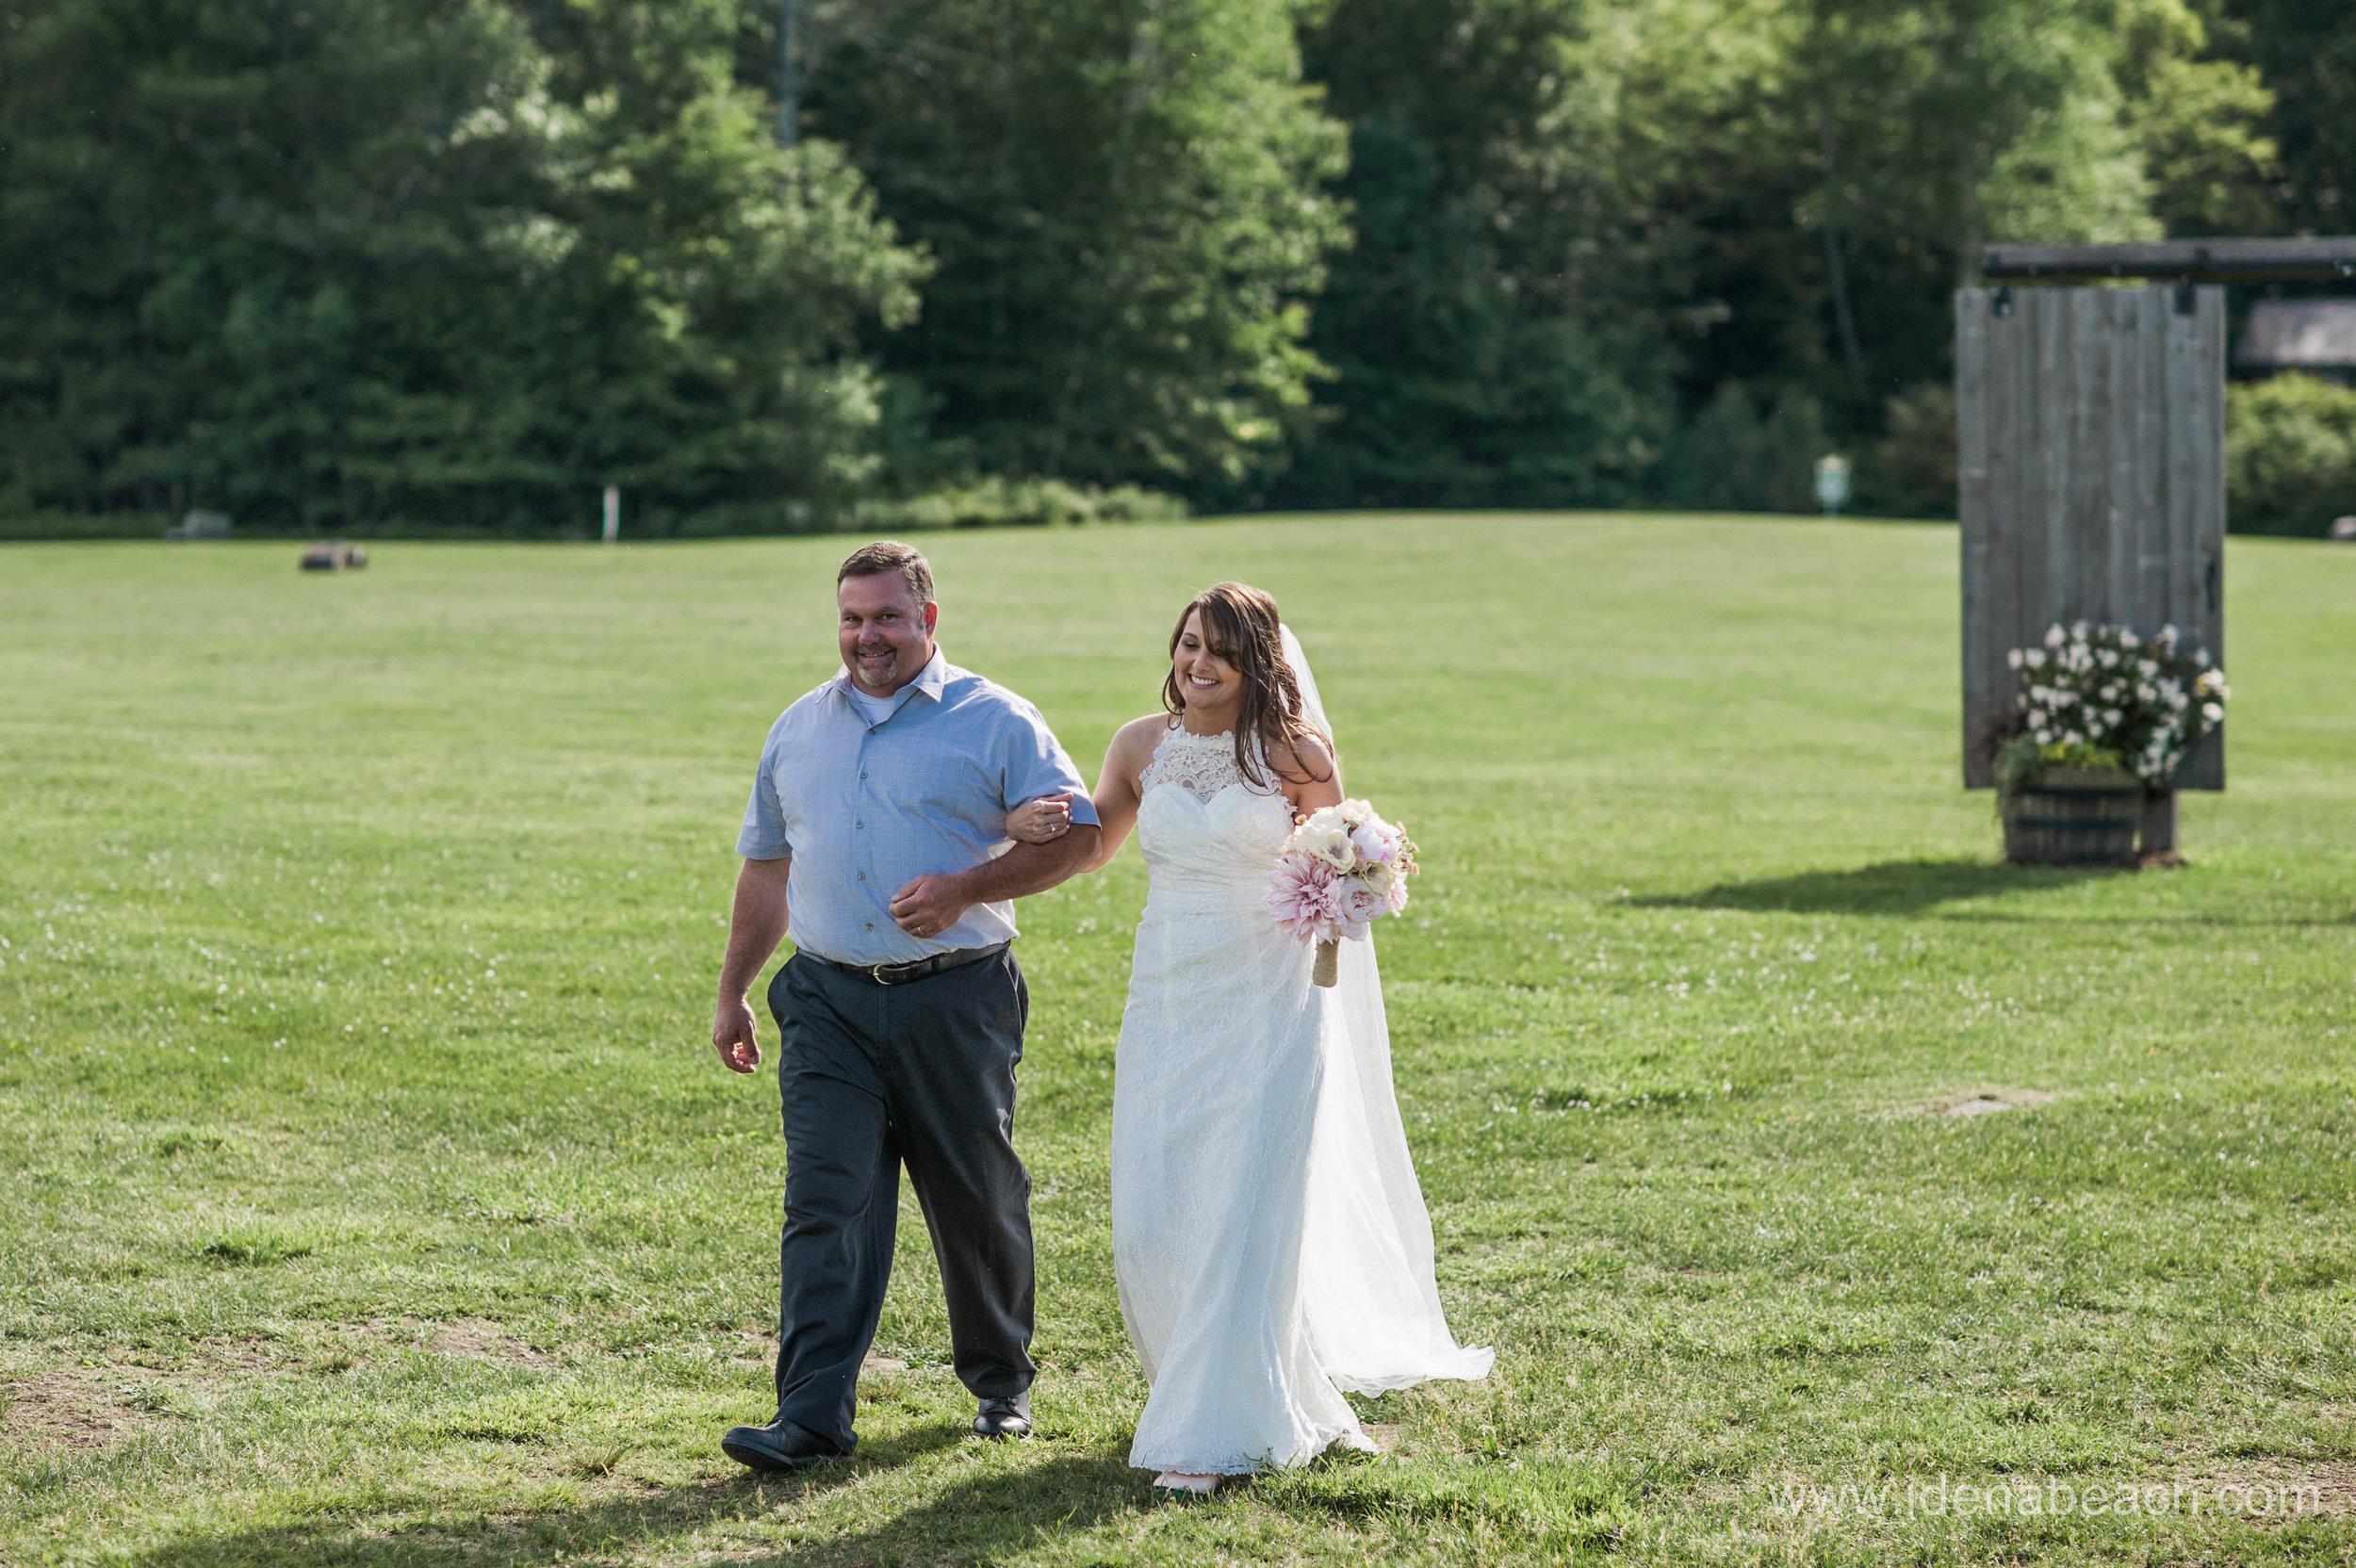 Mountain-Top-Inn-Vermont-Wedding-Photographer-35.jpg